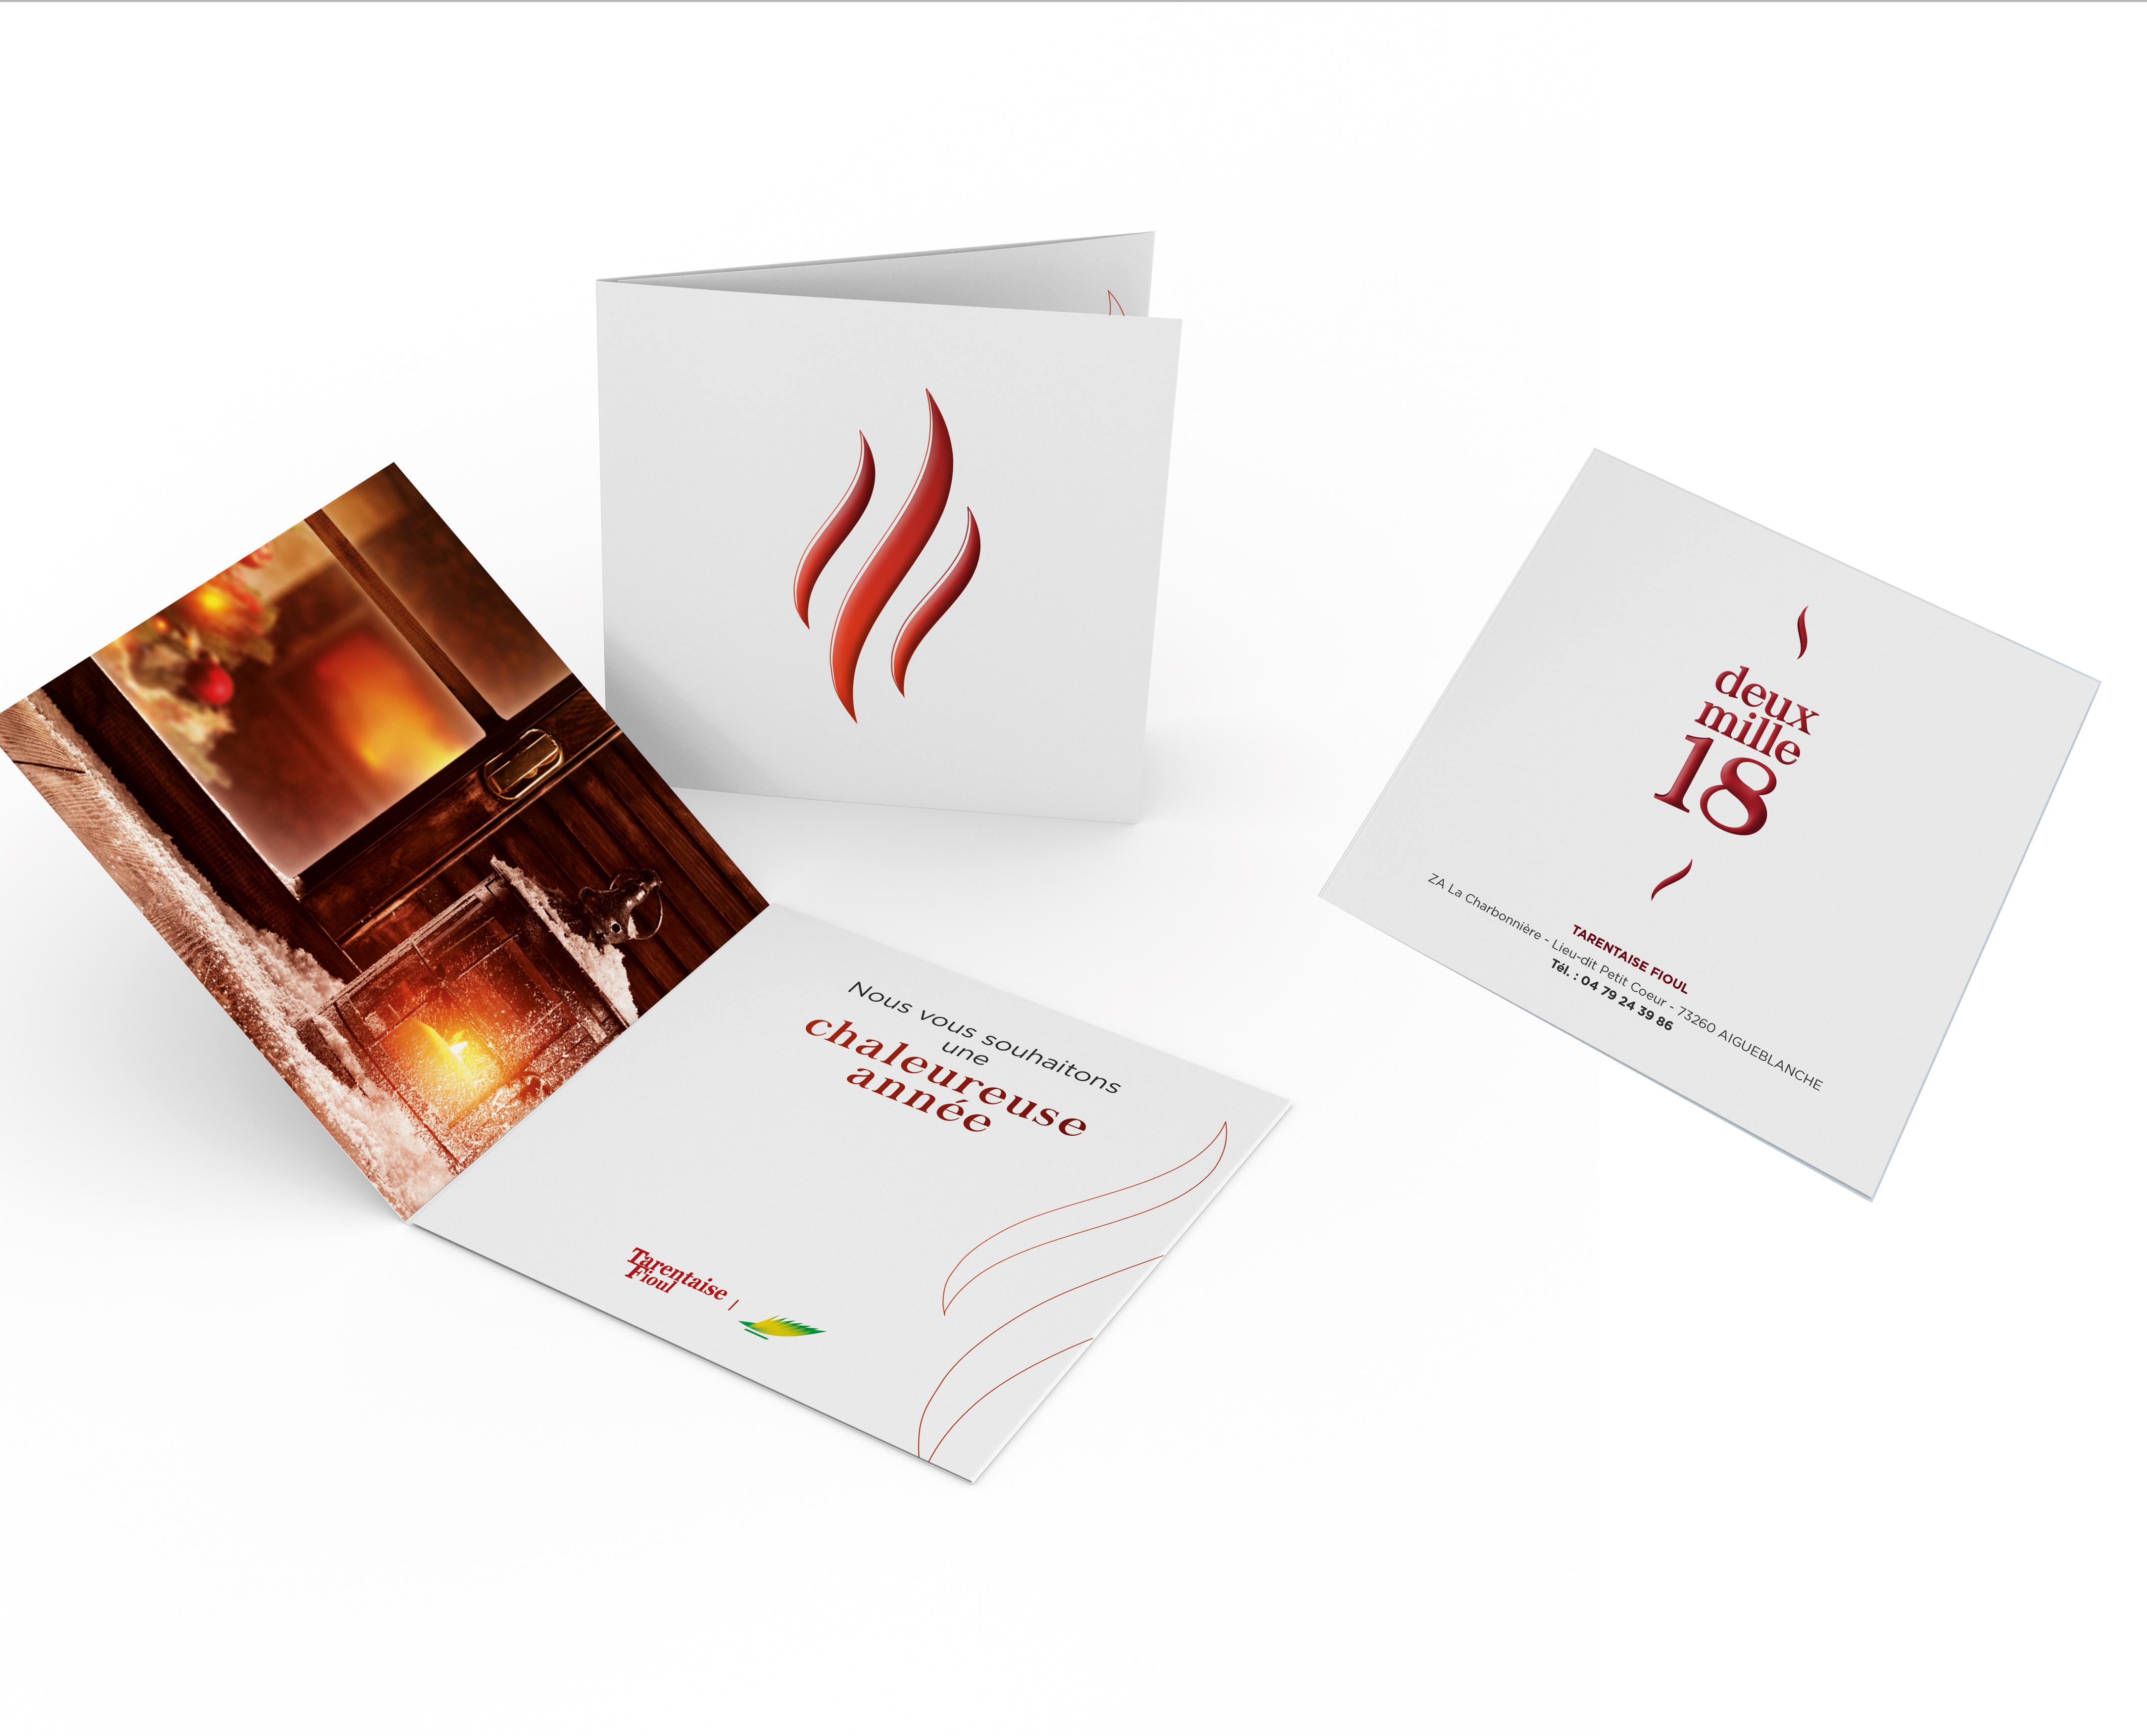 Creative Altitude - Agence Communication - Savoie - site-internet - logo - web - print - Carte de voeux Tarentaise Fioul